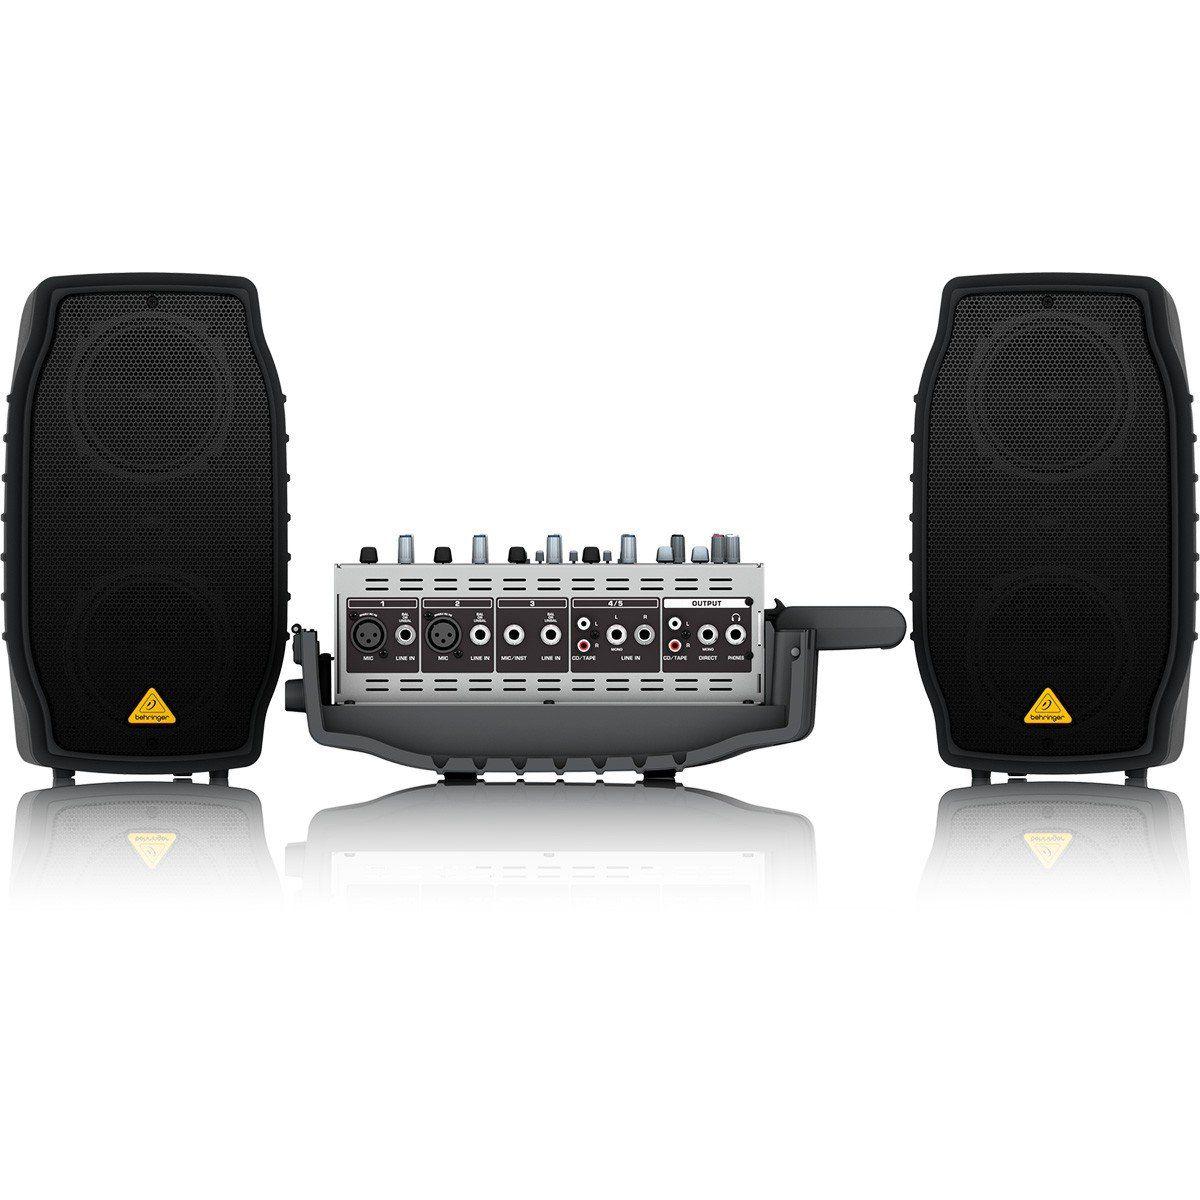 Behringer EuroPort EPA150 Caixa de Som EPA150 Kit de Pa 150w com Mixer e Microfone